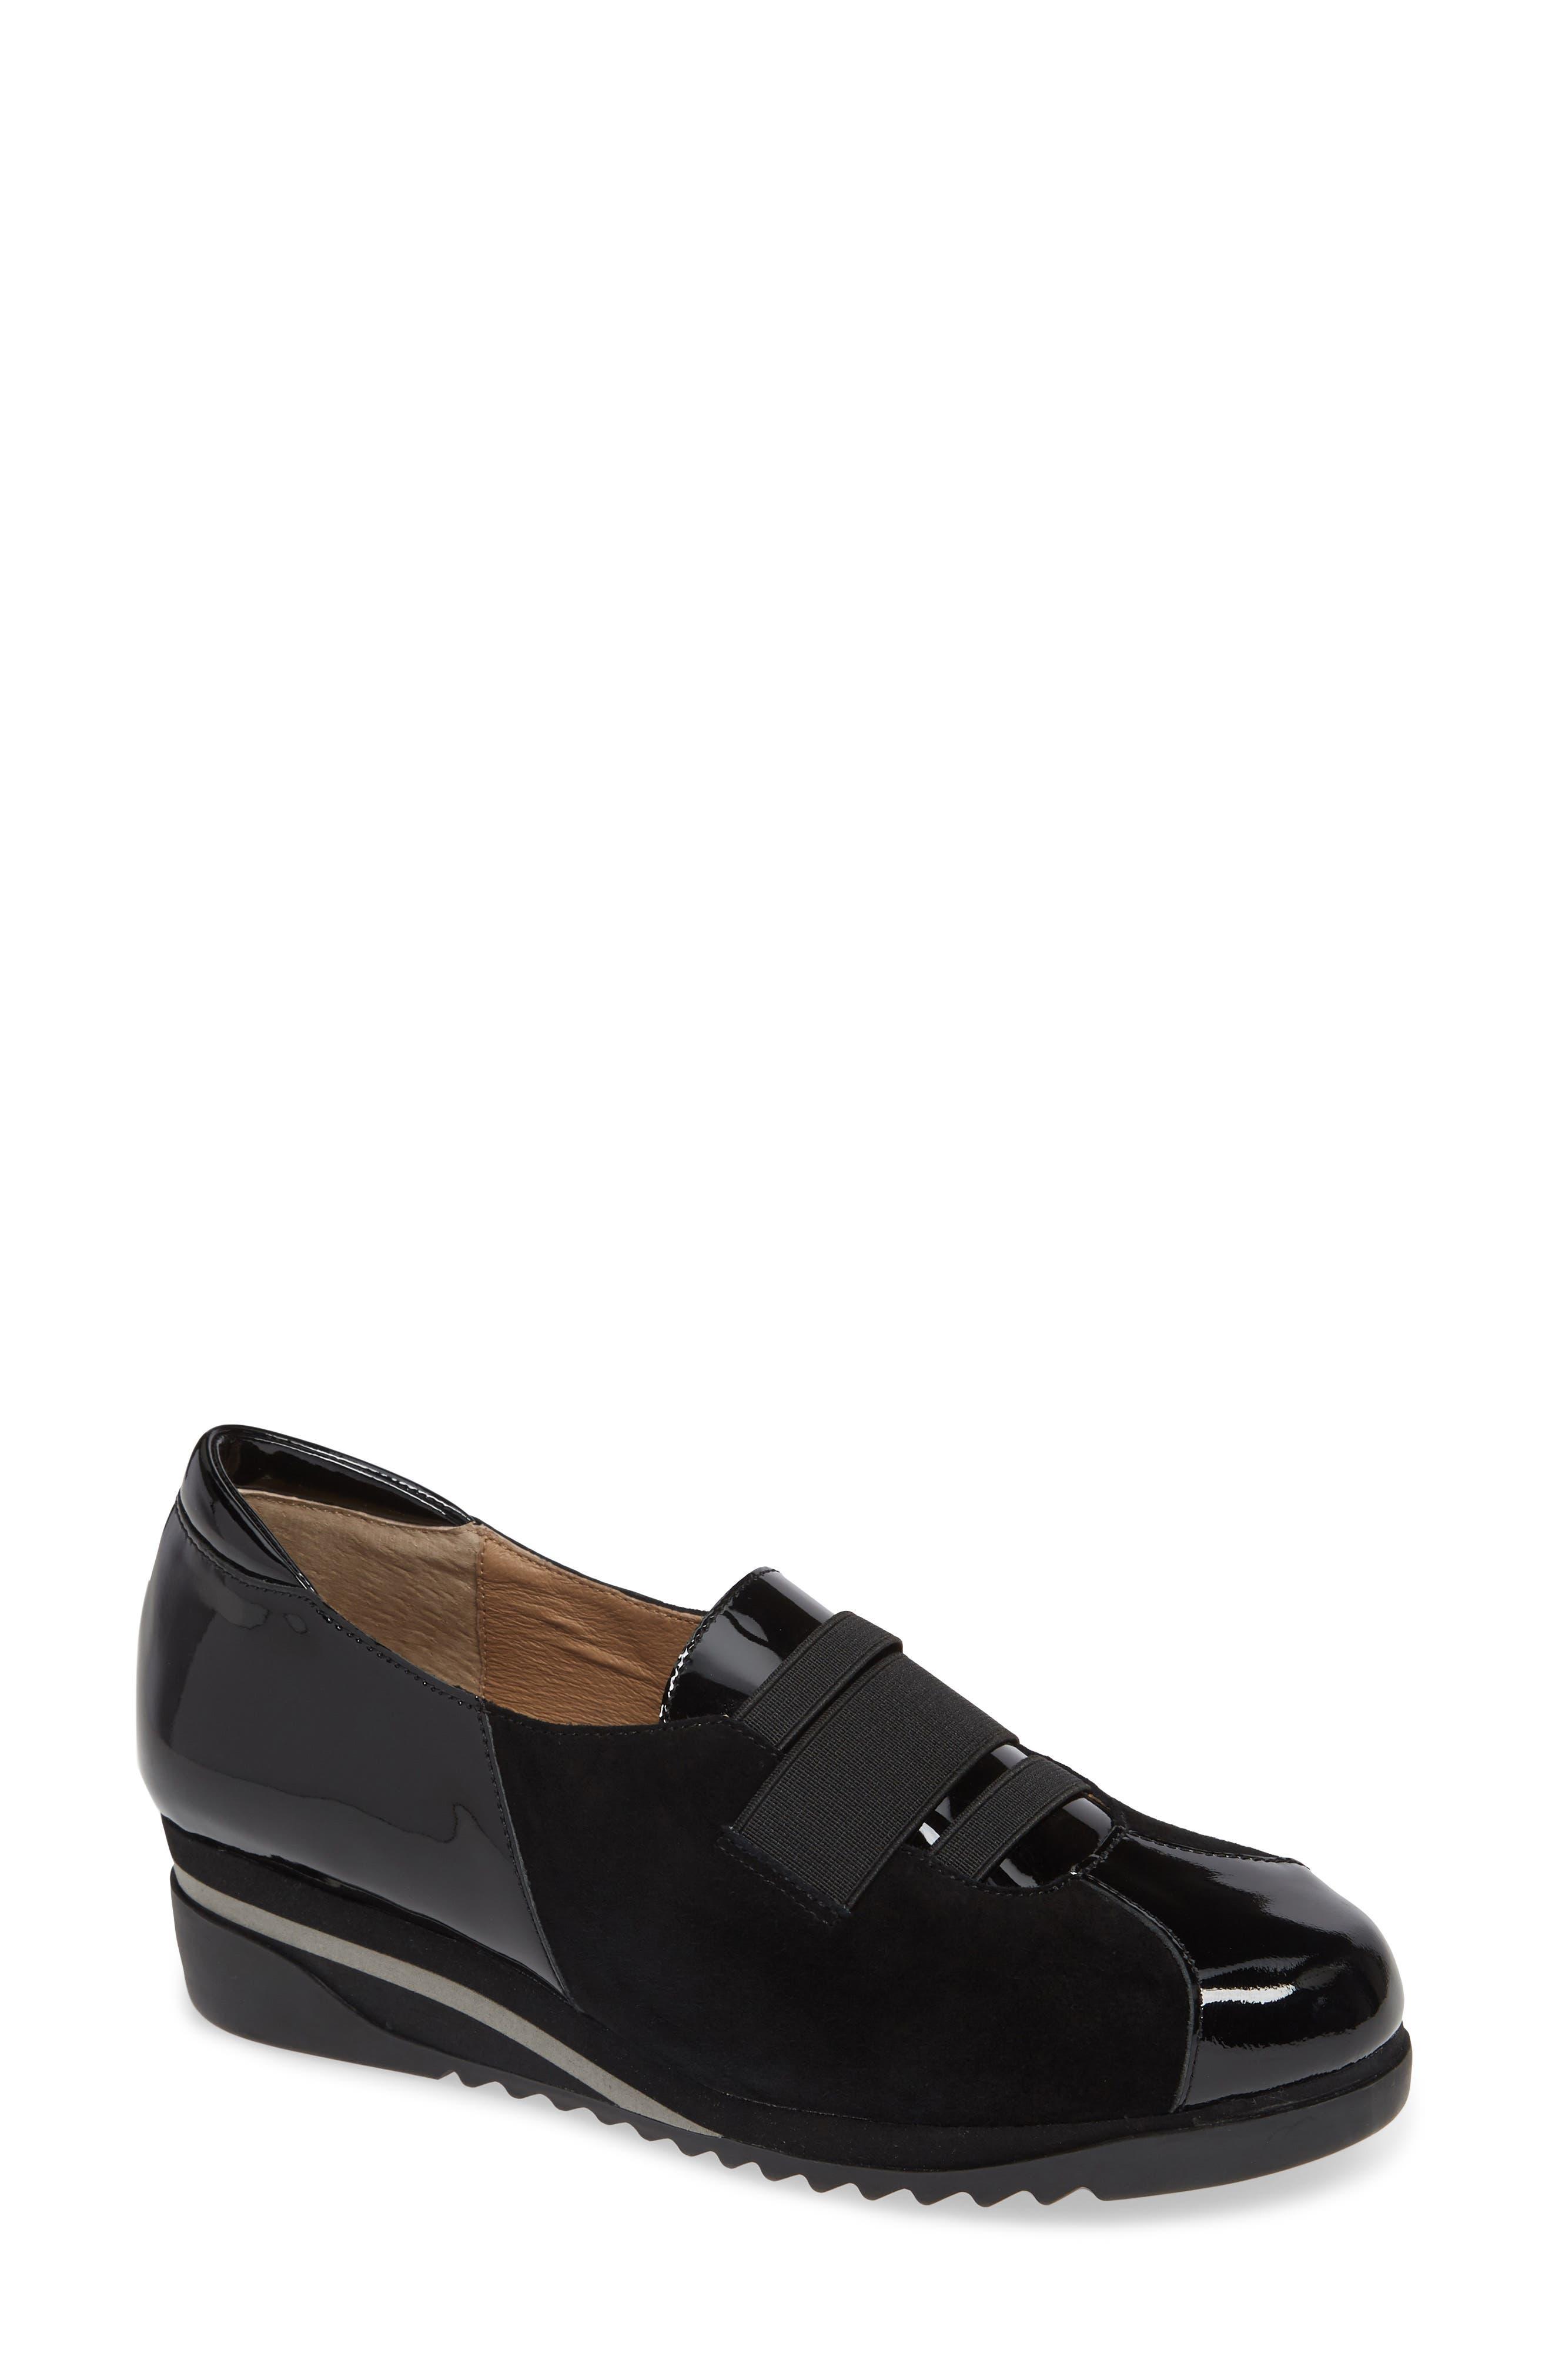 BETTYE MULLER CONCEPTS, Taytum Sneaker, Main thumbnail 1, color, BLACK SUEDE